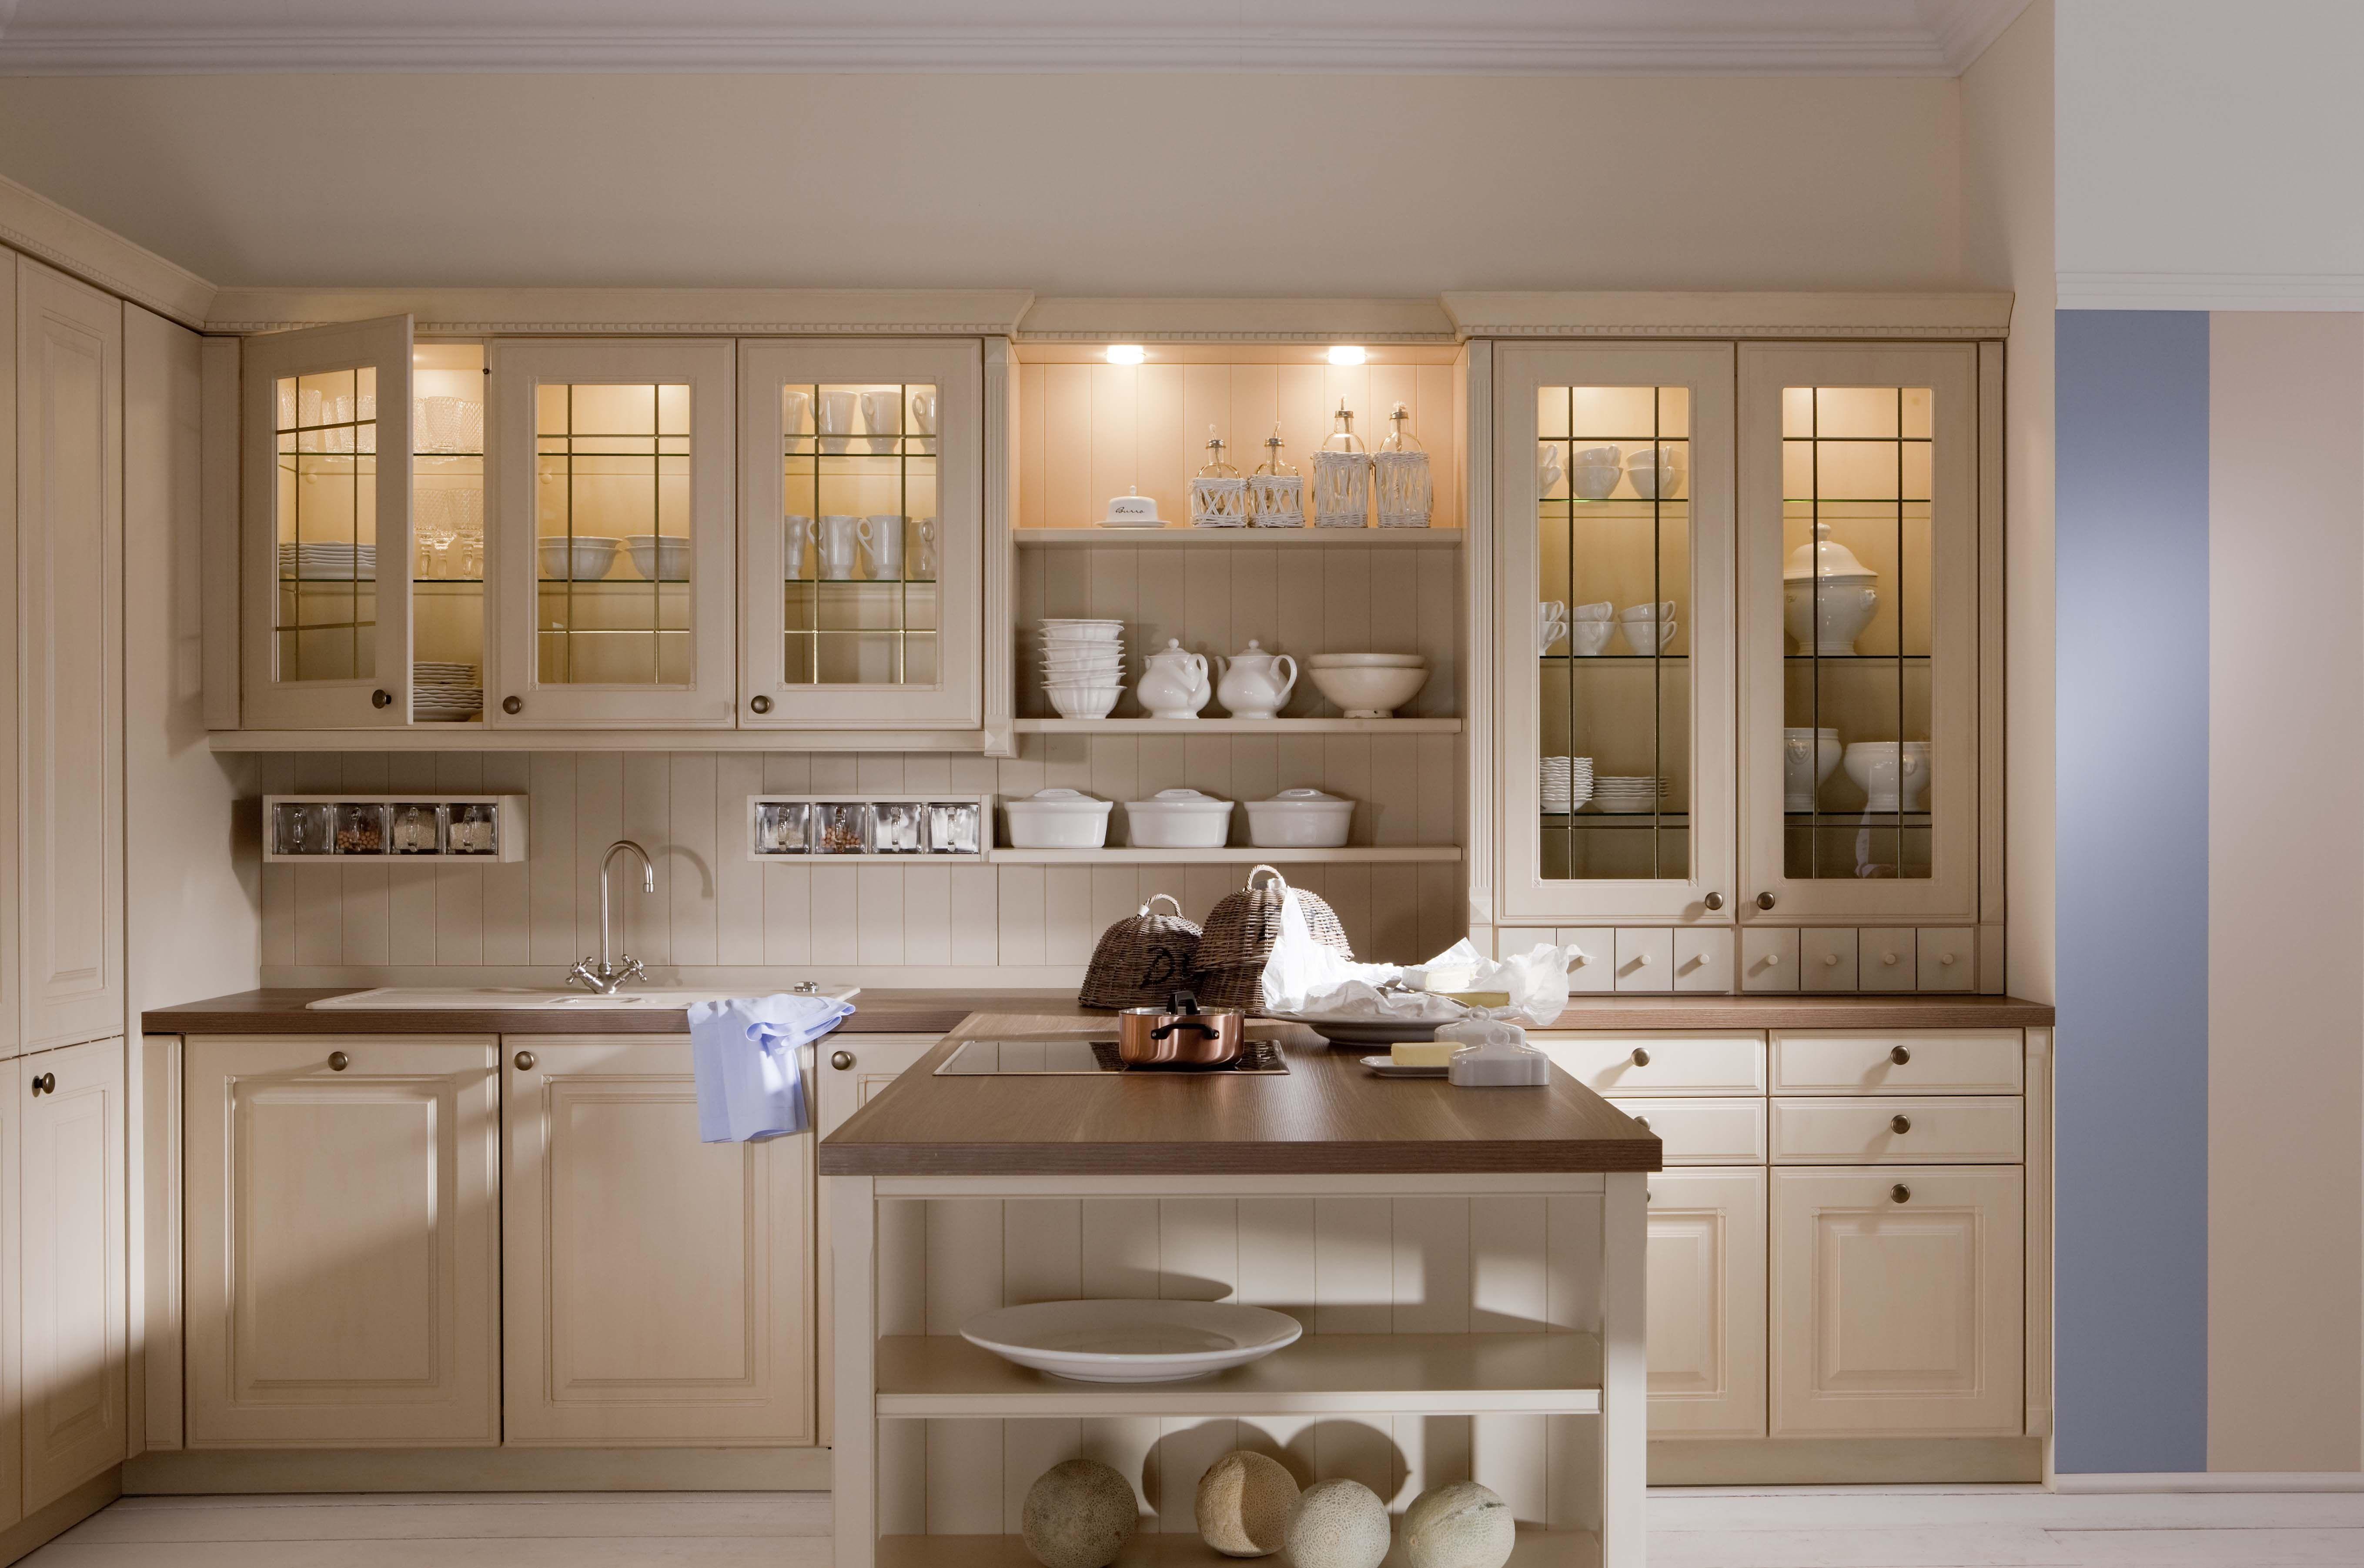 Kastjes Open Keuken : Open kasten woonkamer kasten naast elkaar evt in woonkamer